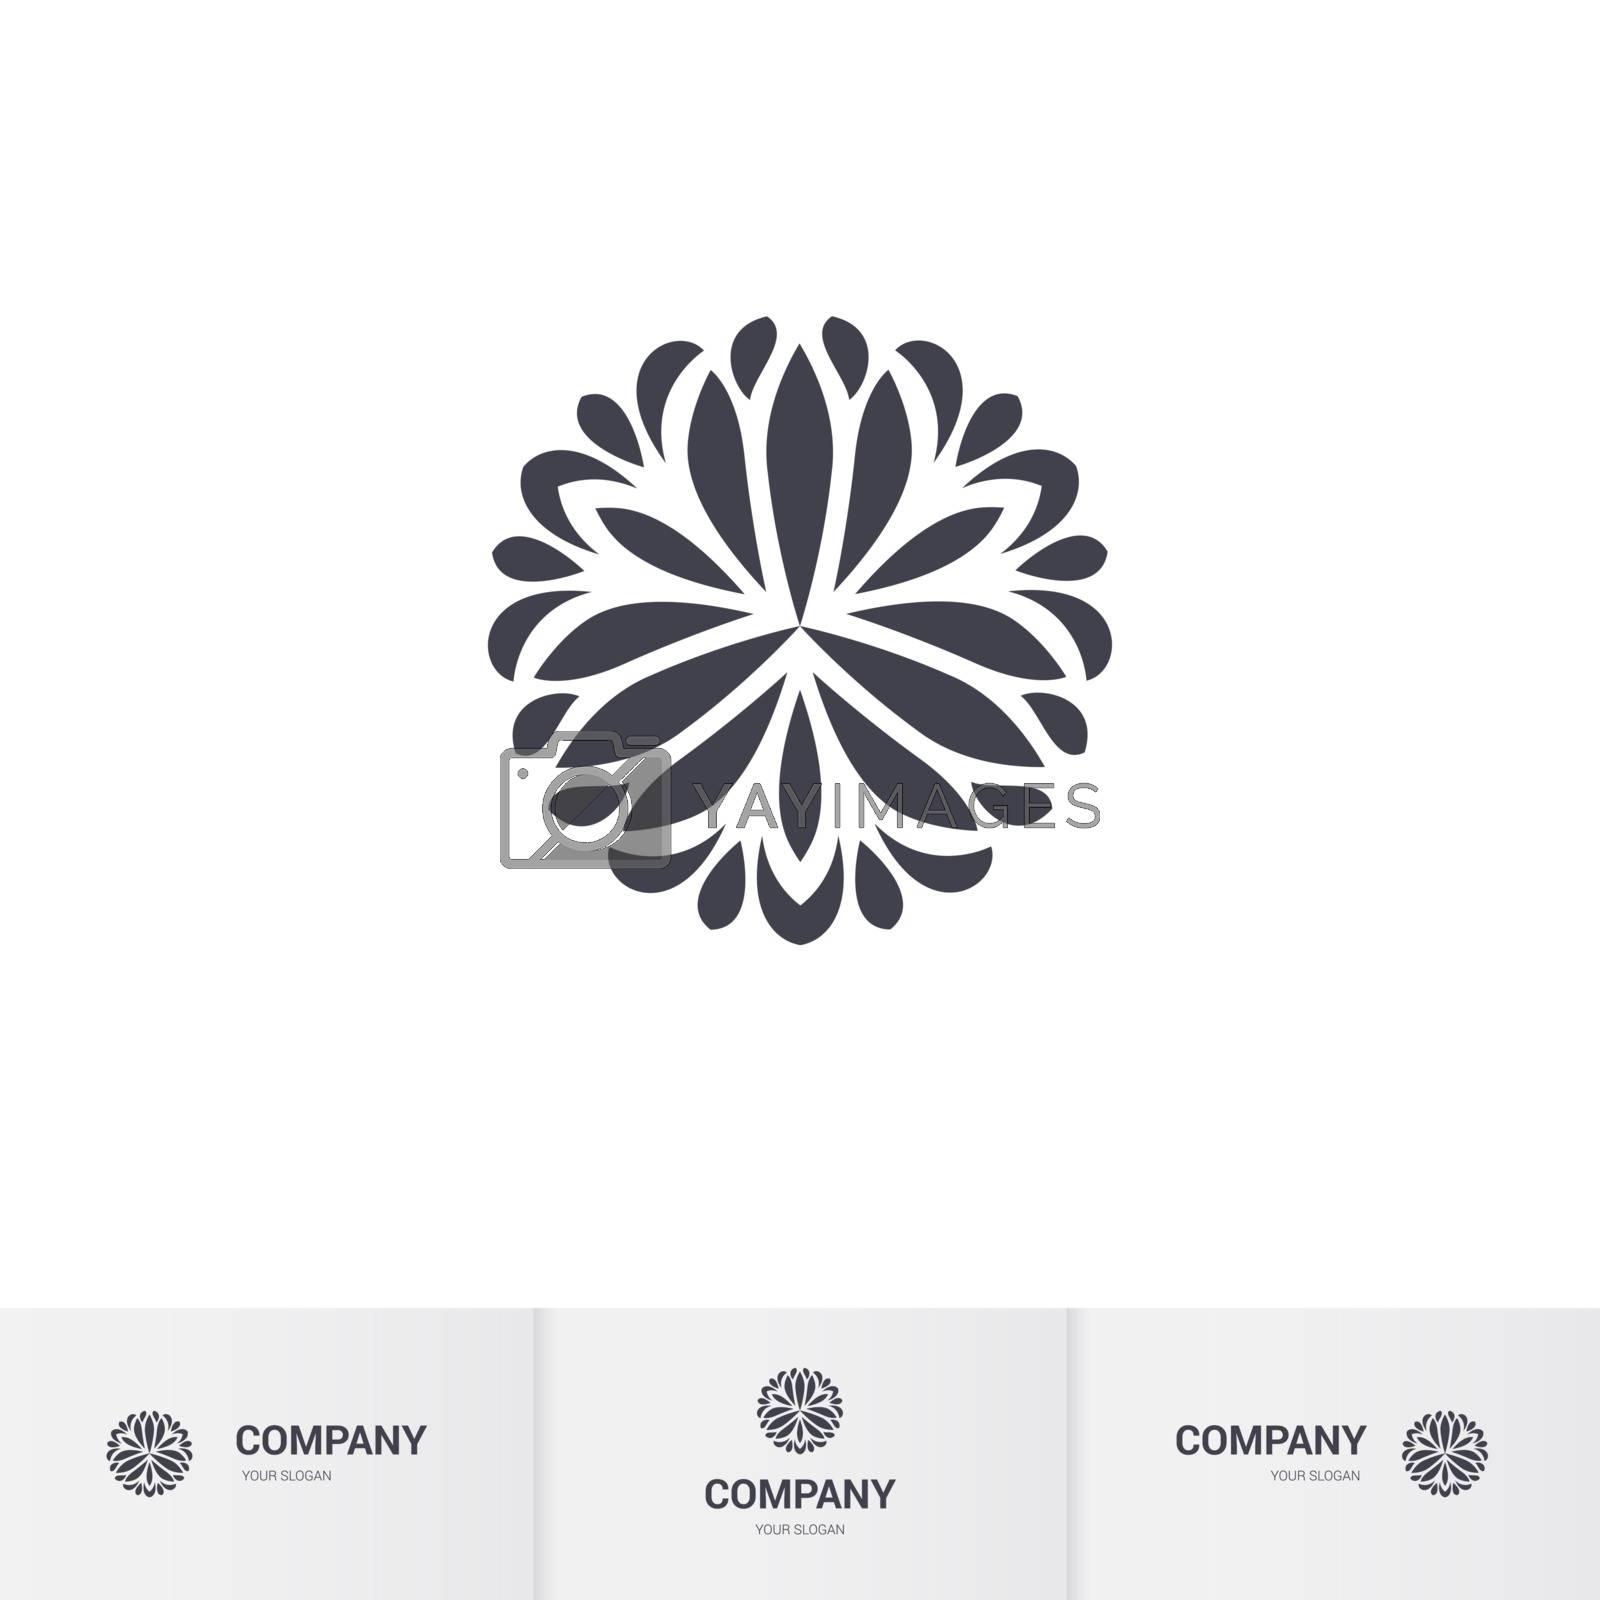 Abstract Floral Geometric Element for Circular Logo. Company Emblem, Element. Simple Geometric Mandala Logotype